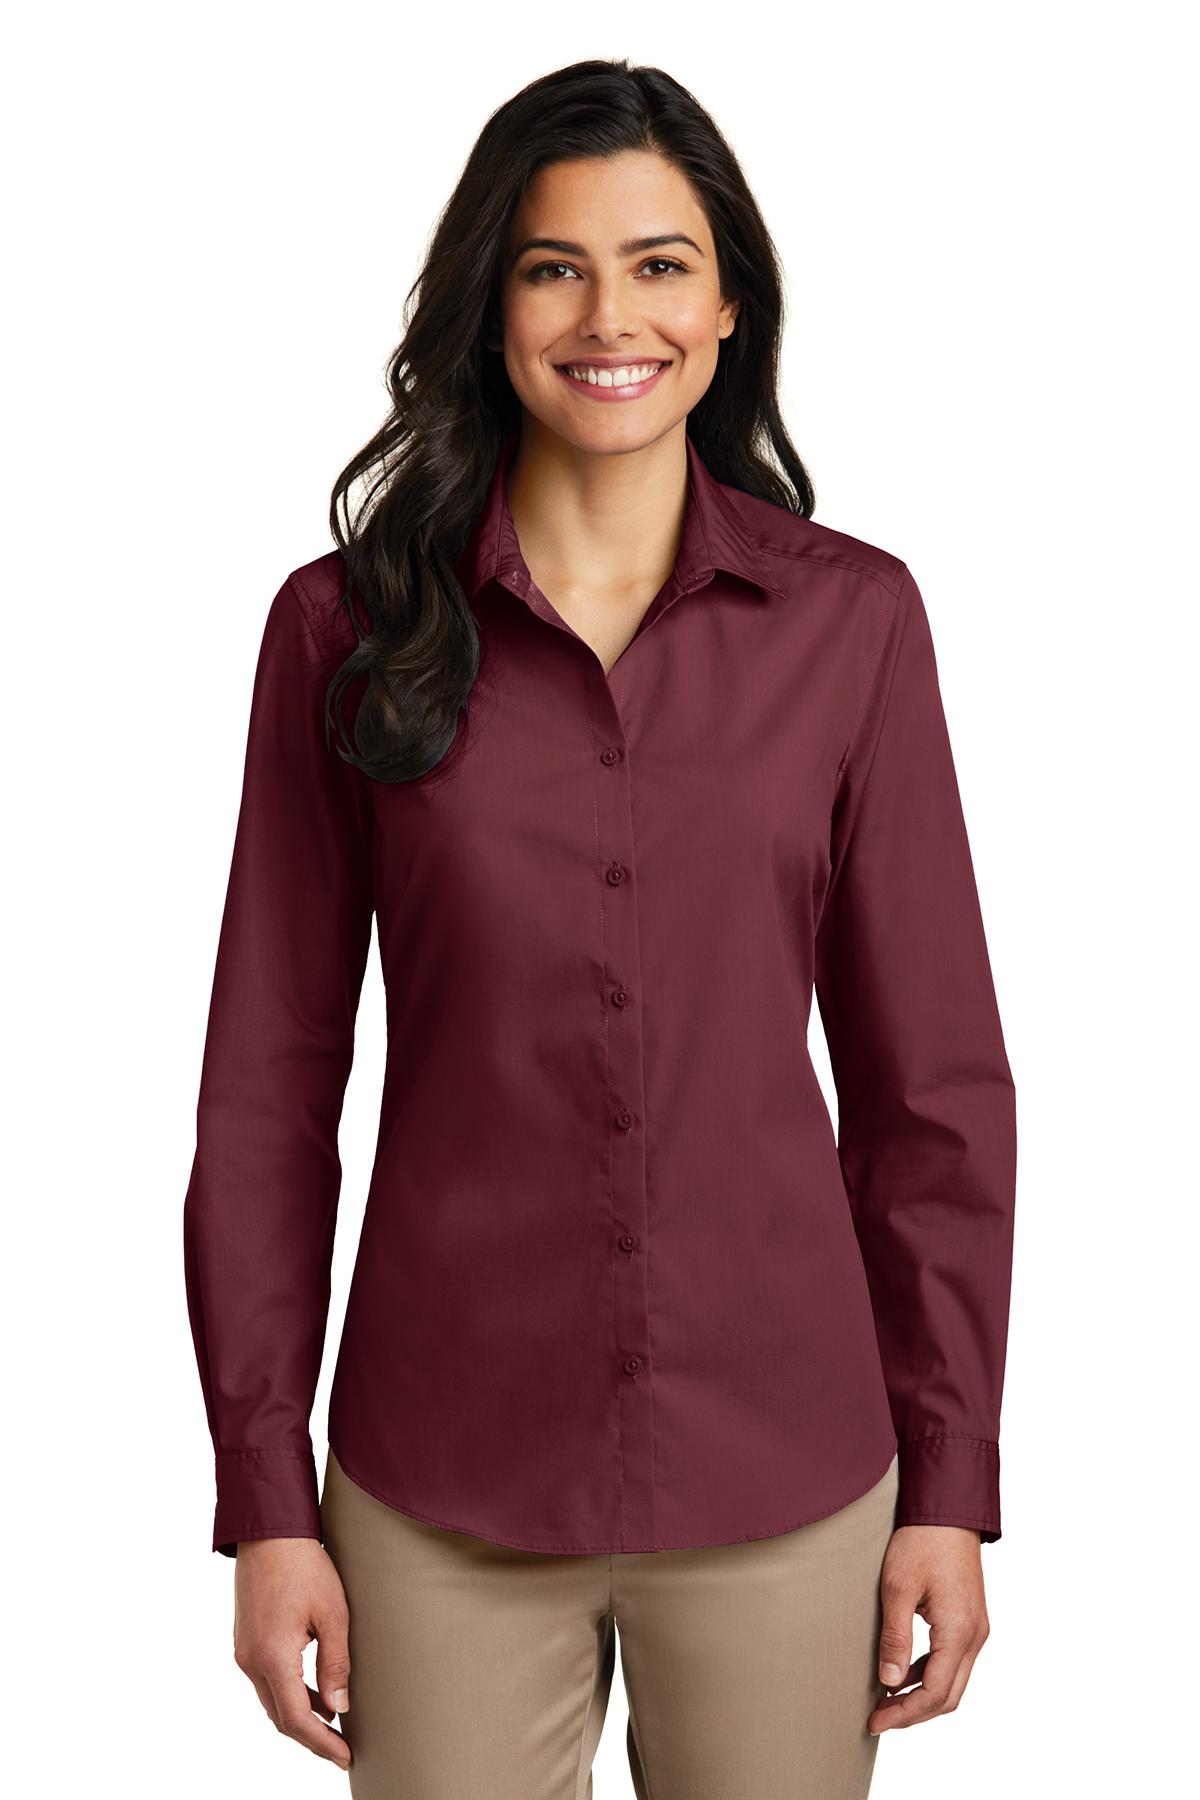 3b95ccd5ebb Port Authority® Ladies Long Sleeve Carefree Poplin Shirt